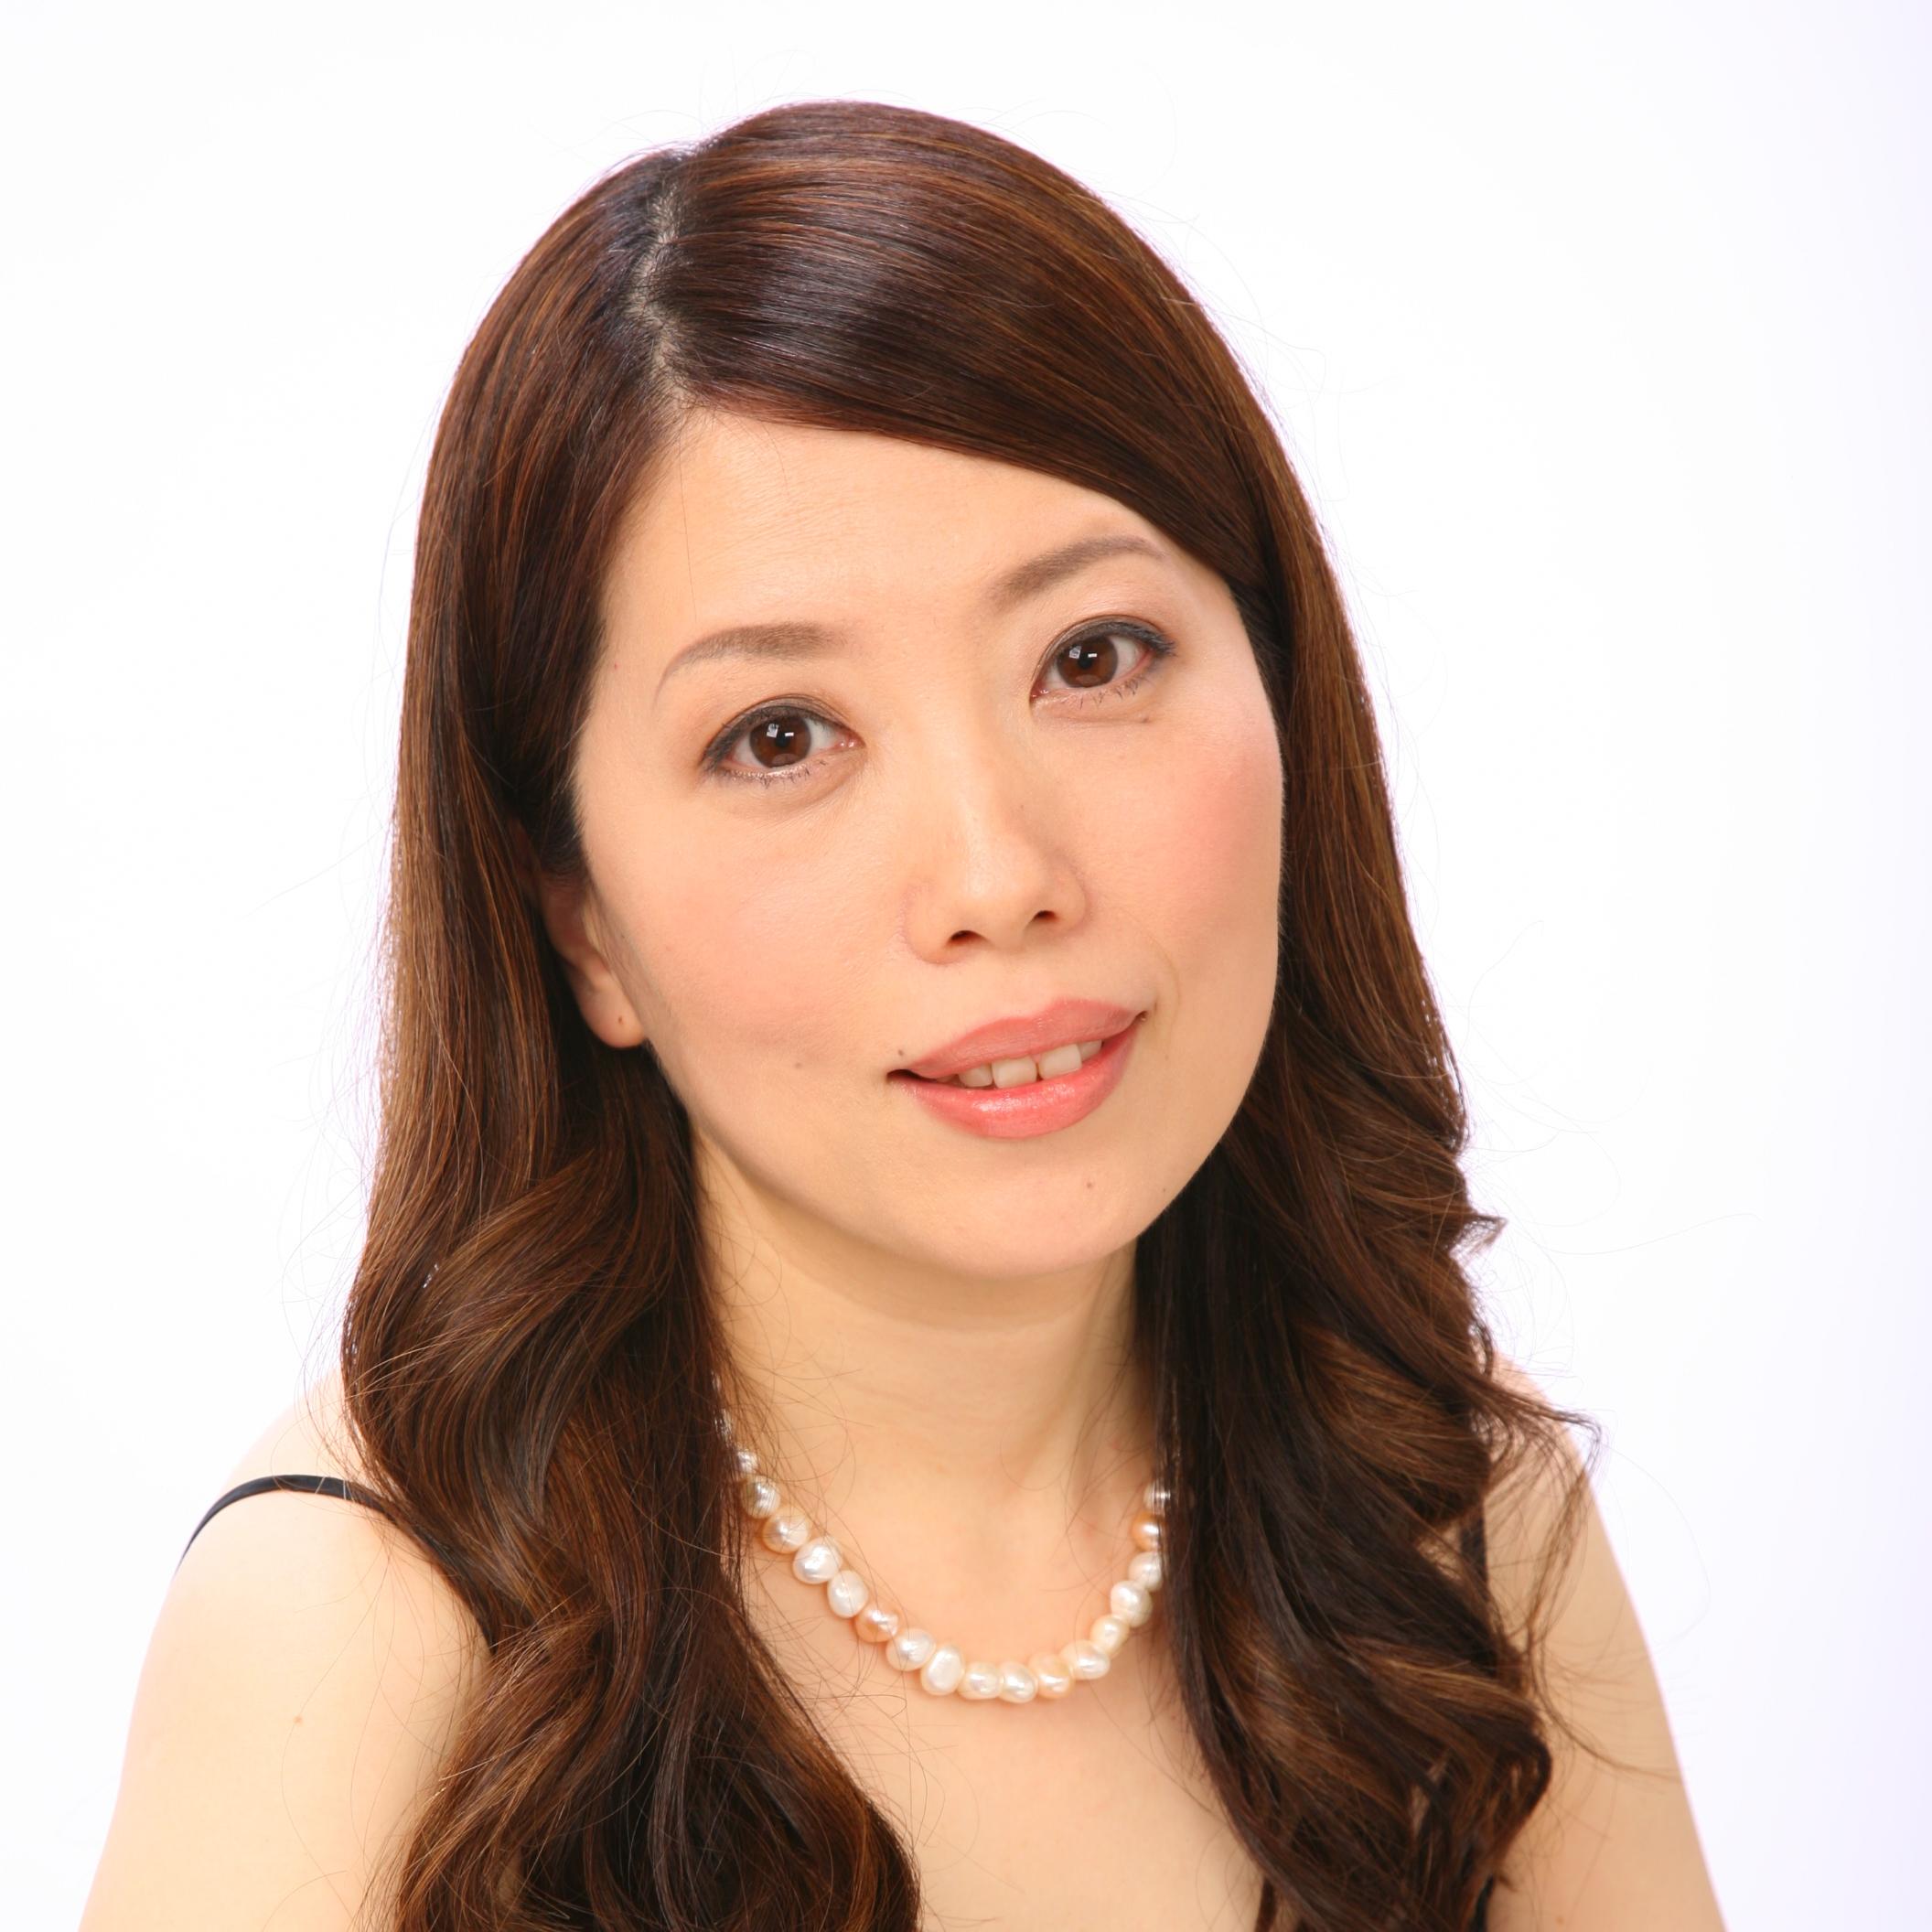 yamaguchikaori